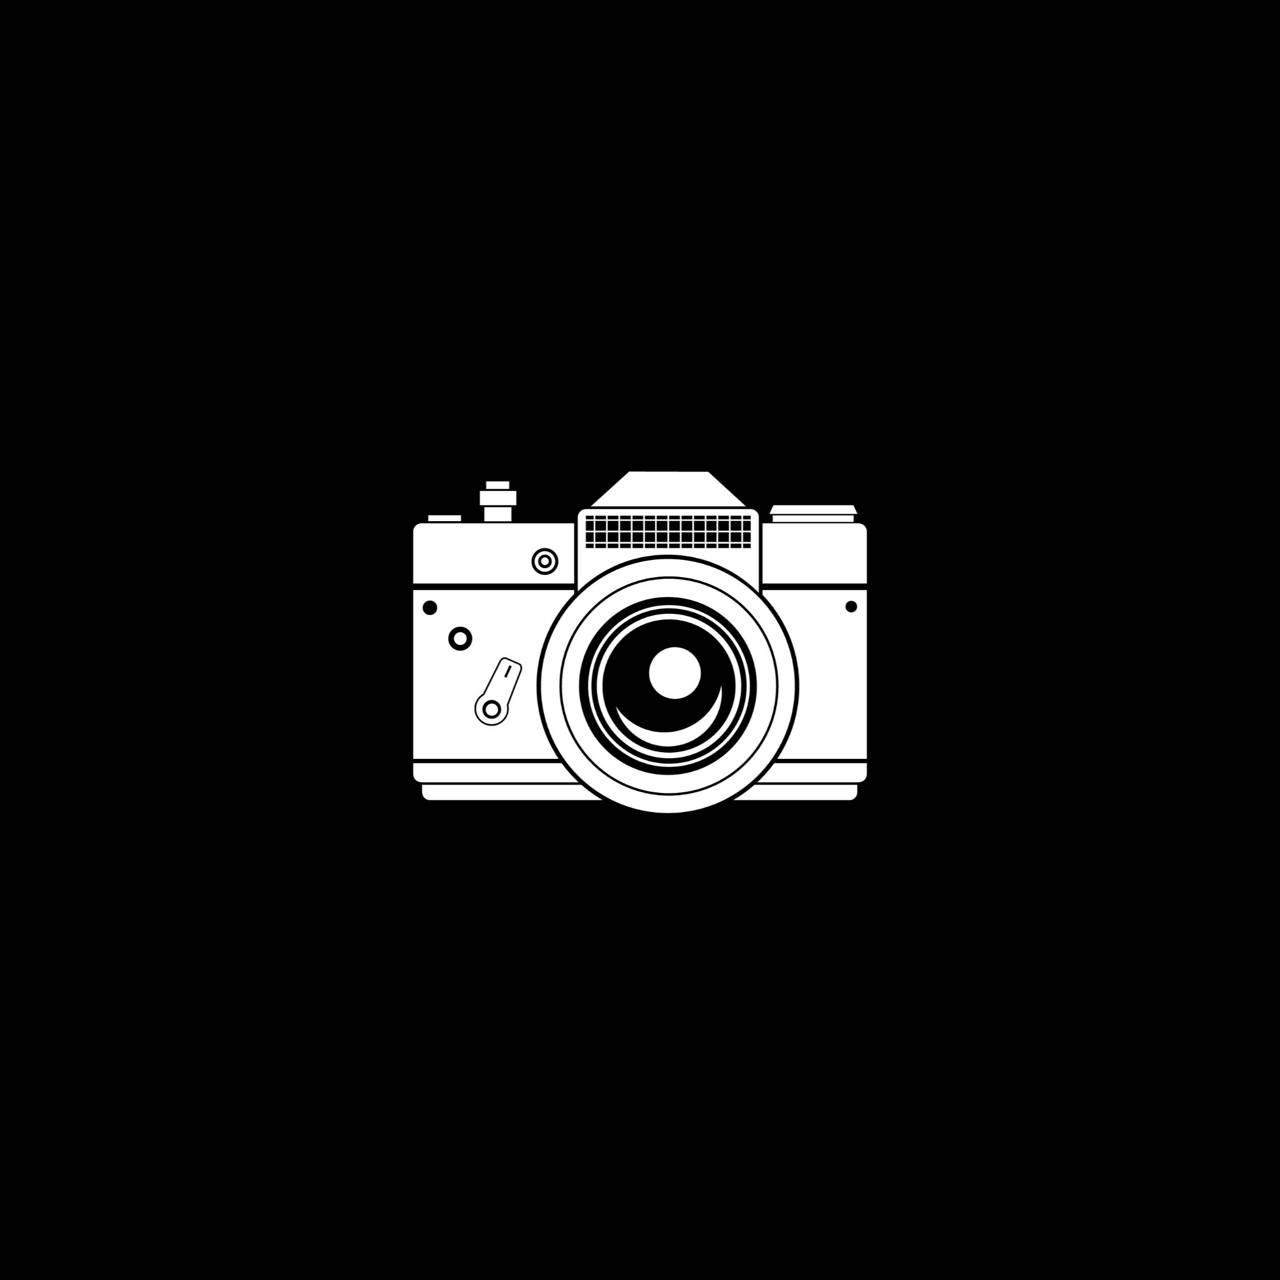 Pixel cam